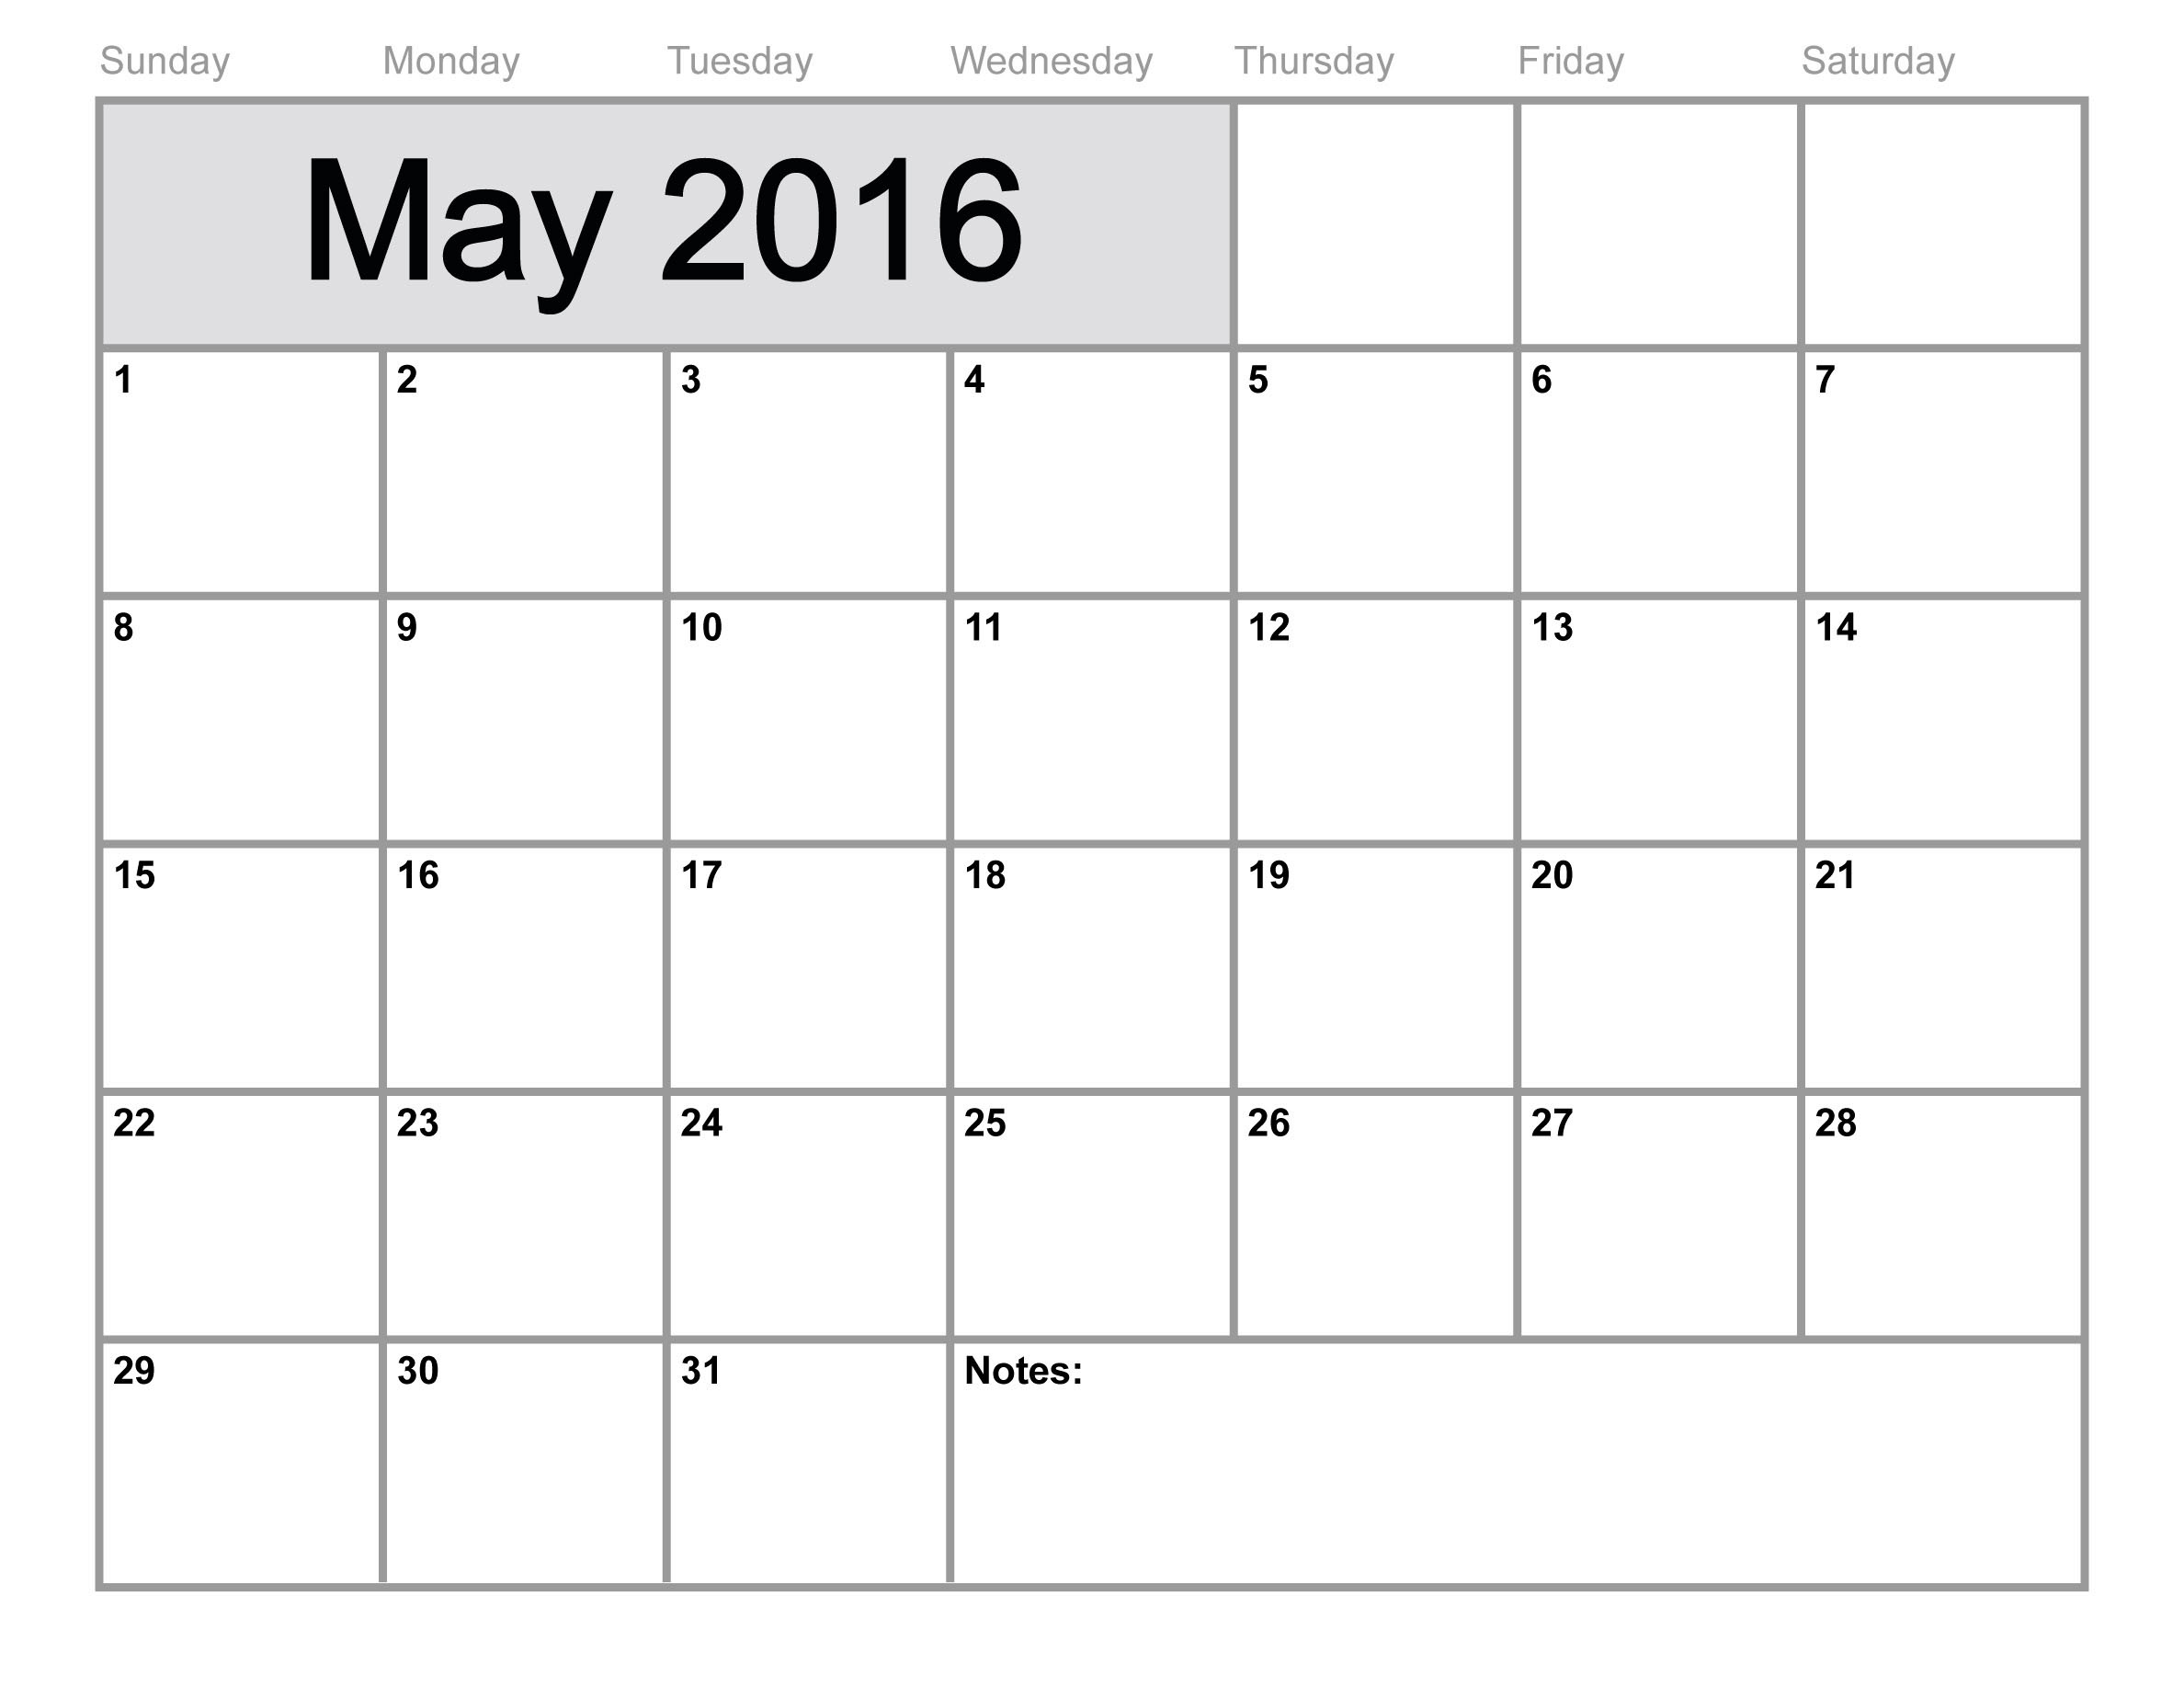 Blank Monthly Calendar Template 2016 from lh3.googleusercontent.com